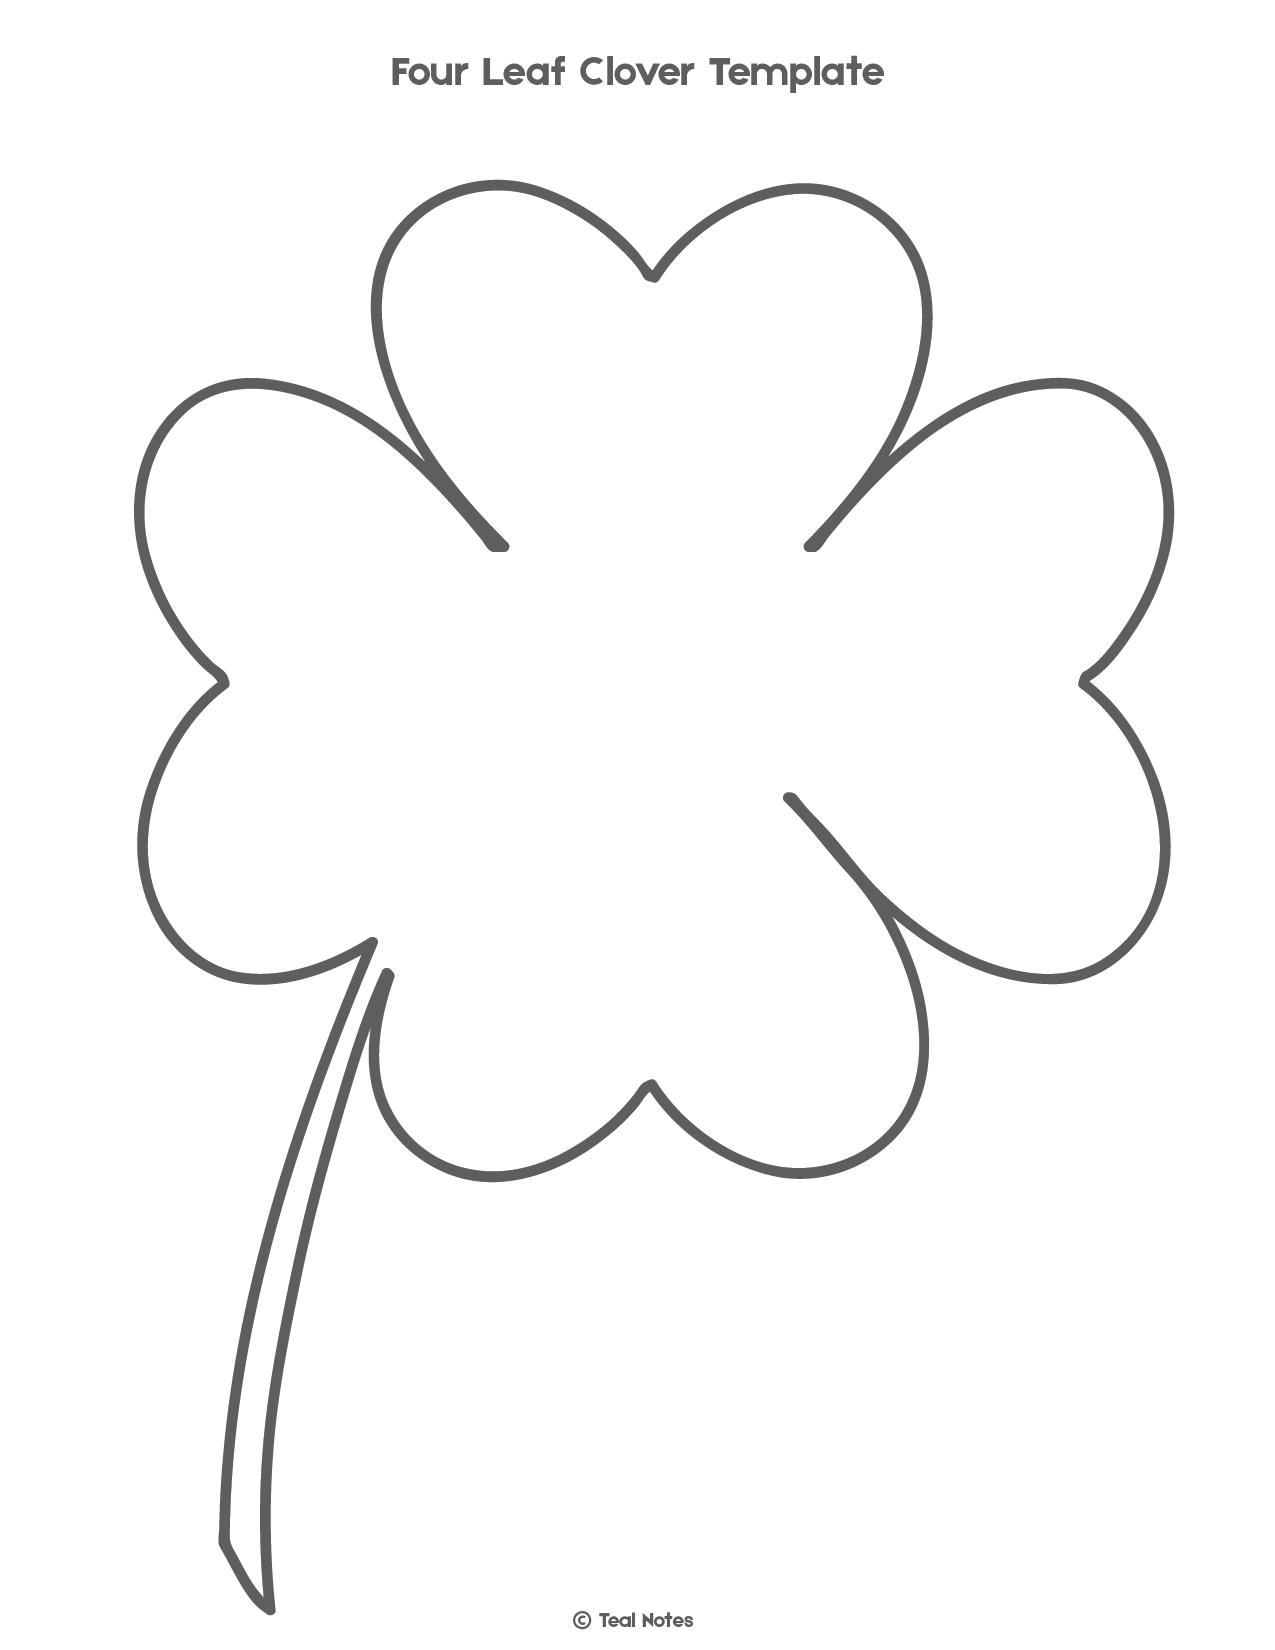 Four Leaf Clover Template: Free Shamrock Template Printable | Free - Four Leaf Clover Template Printable Free